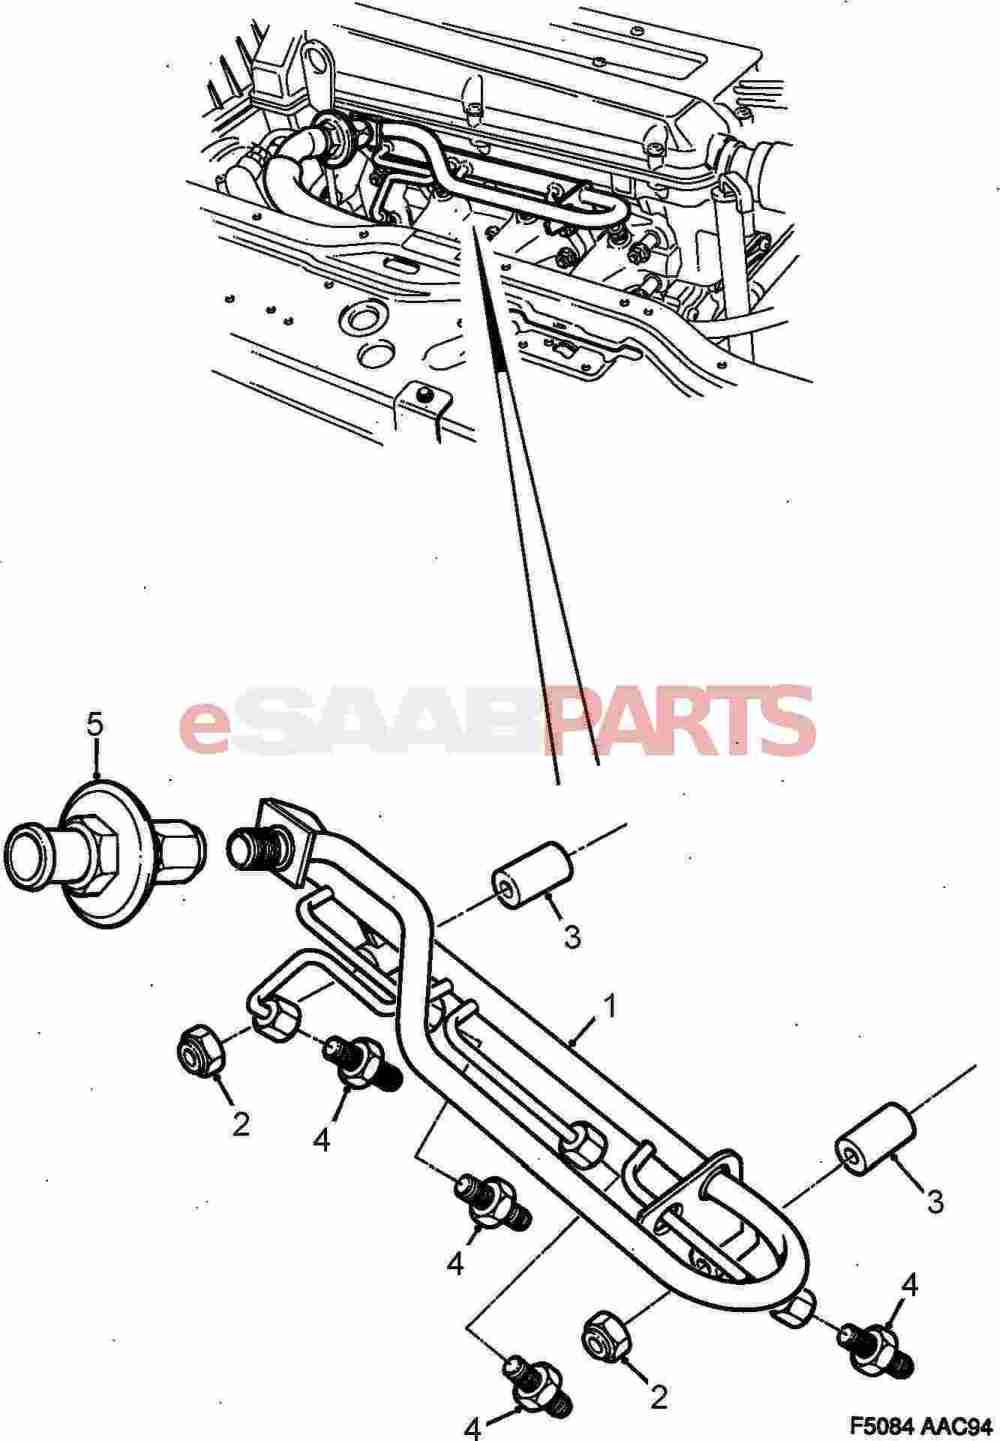 medium resolution of check valve part diagram